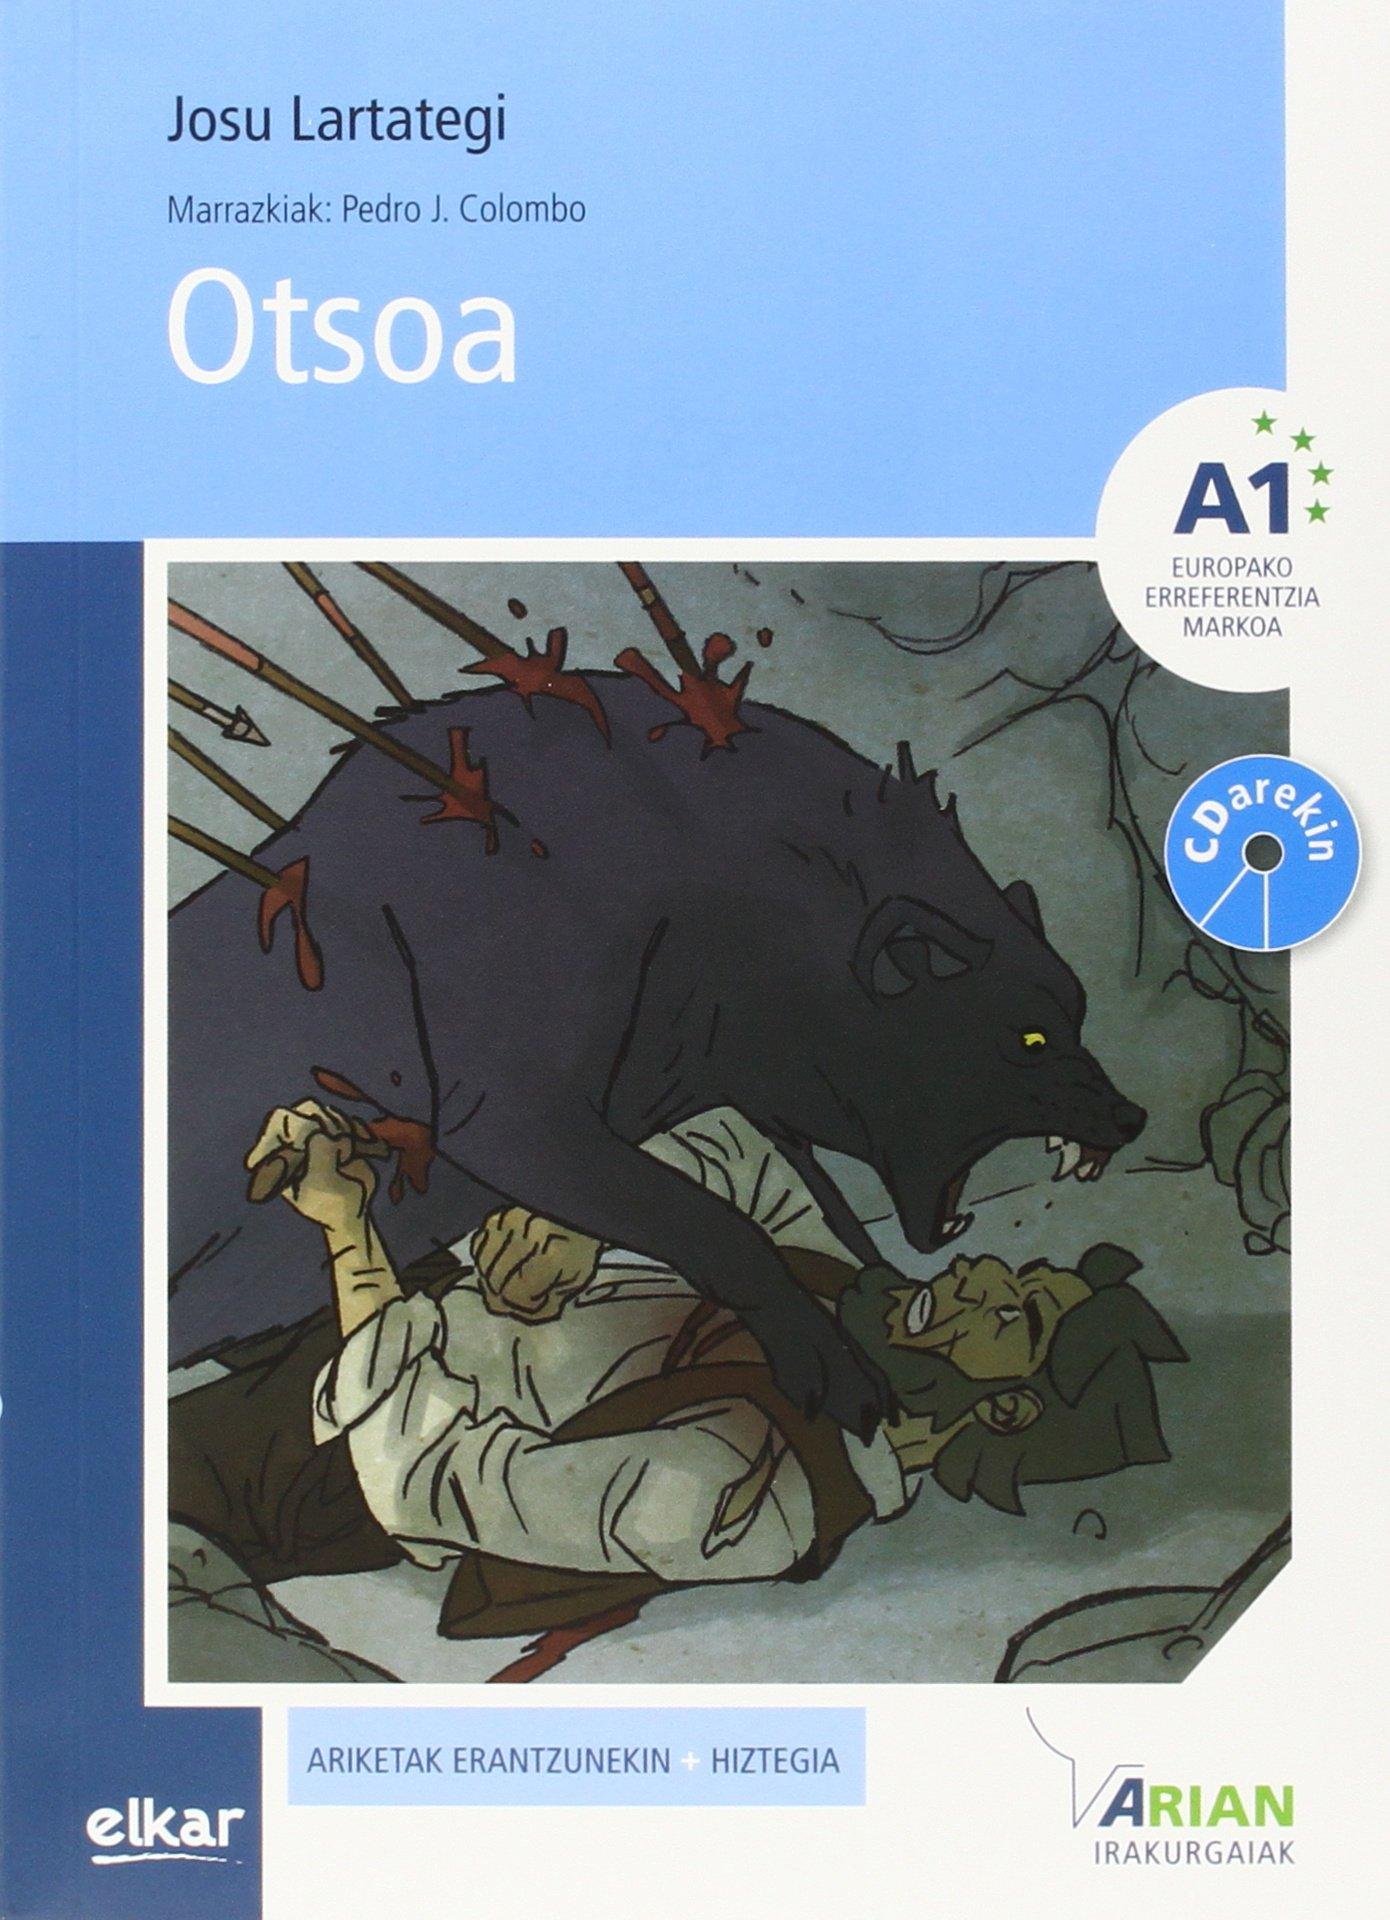 Otsoa (+CDa) (Arian irakurgaiak) (Euskera) Tapa blanda – 23 may 2012 Josu Lartategi Yustos Pedro J. Colombo López Elkarlanean S.L.